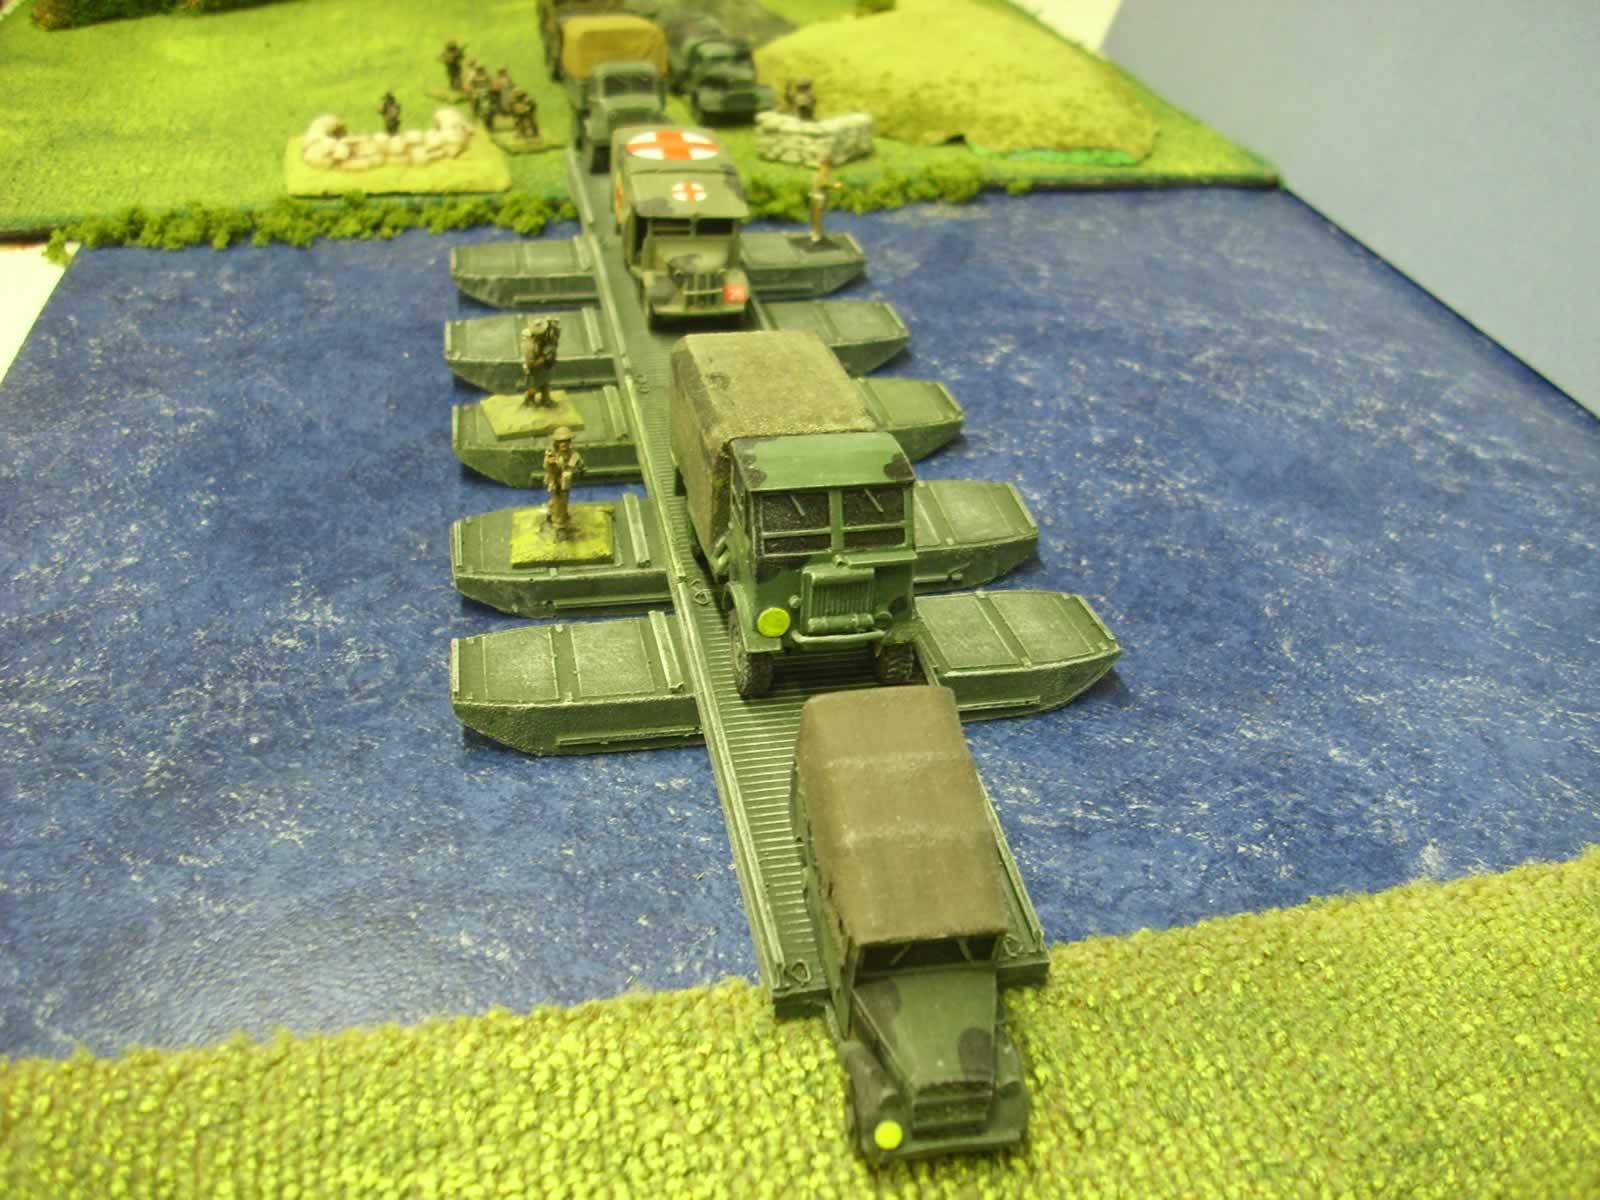 1:72 BRITISH EARLY WW2 PONTOON BRIDGE